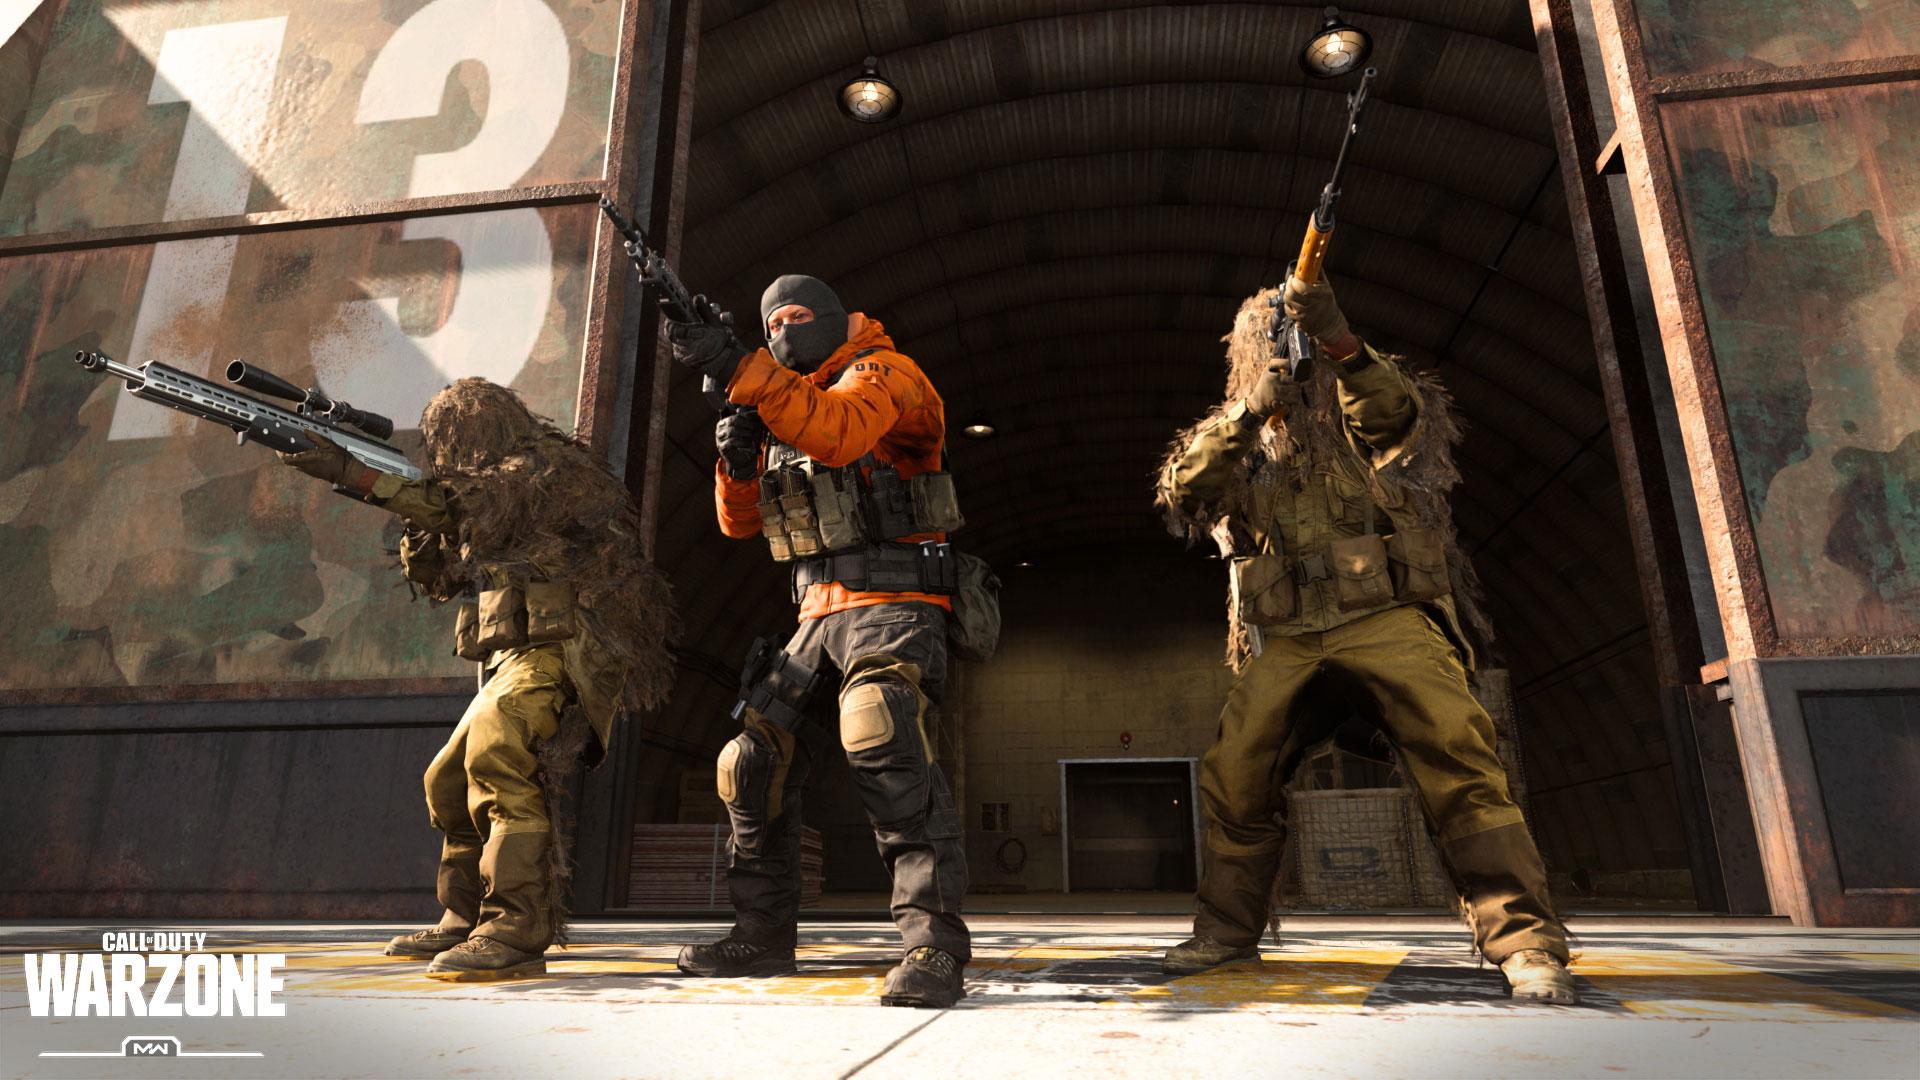 Warzone Mode Recon: Battle Royale - Image 5